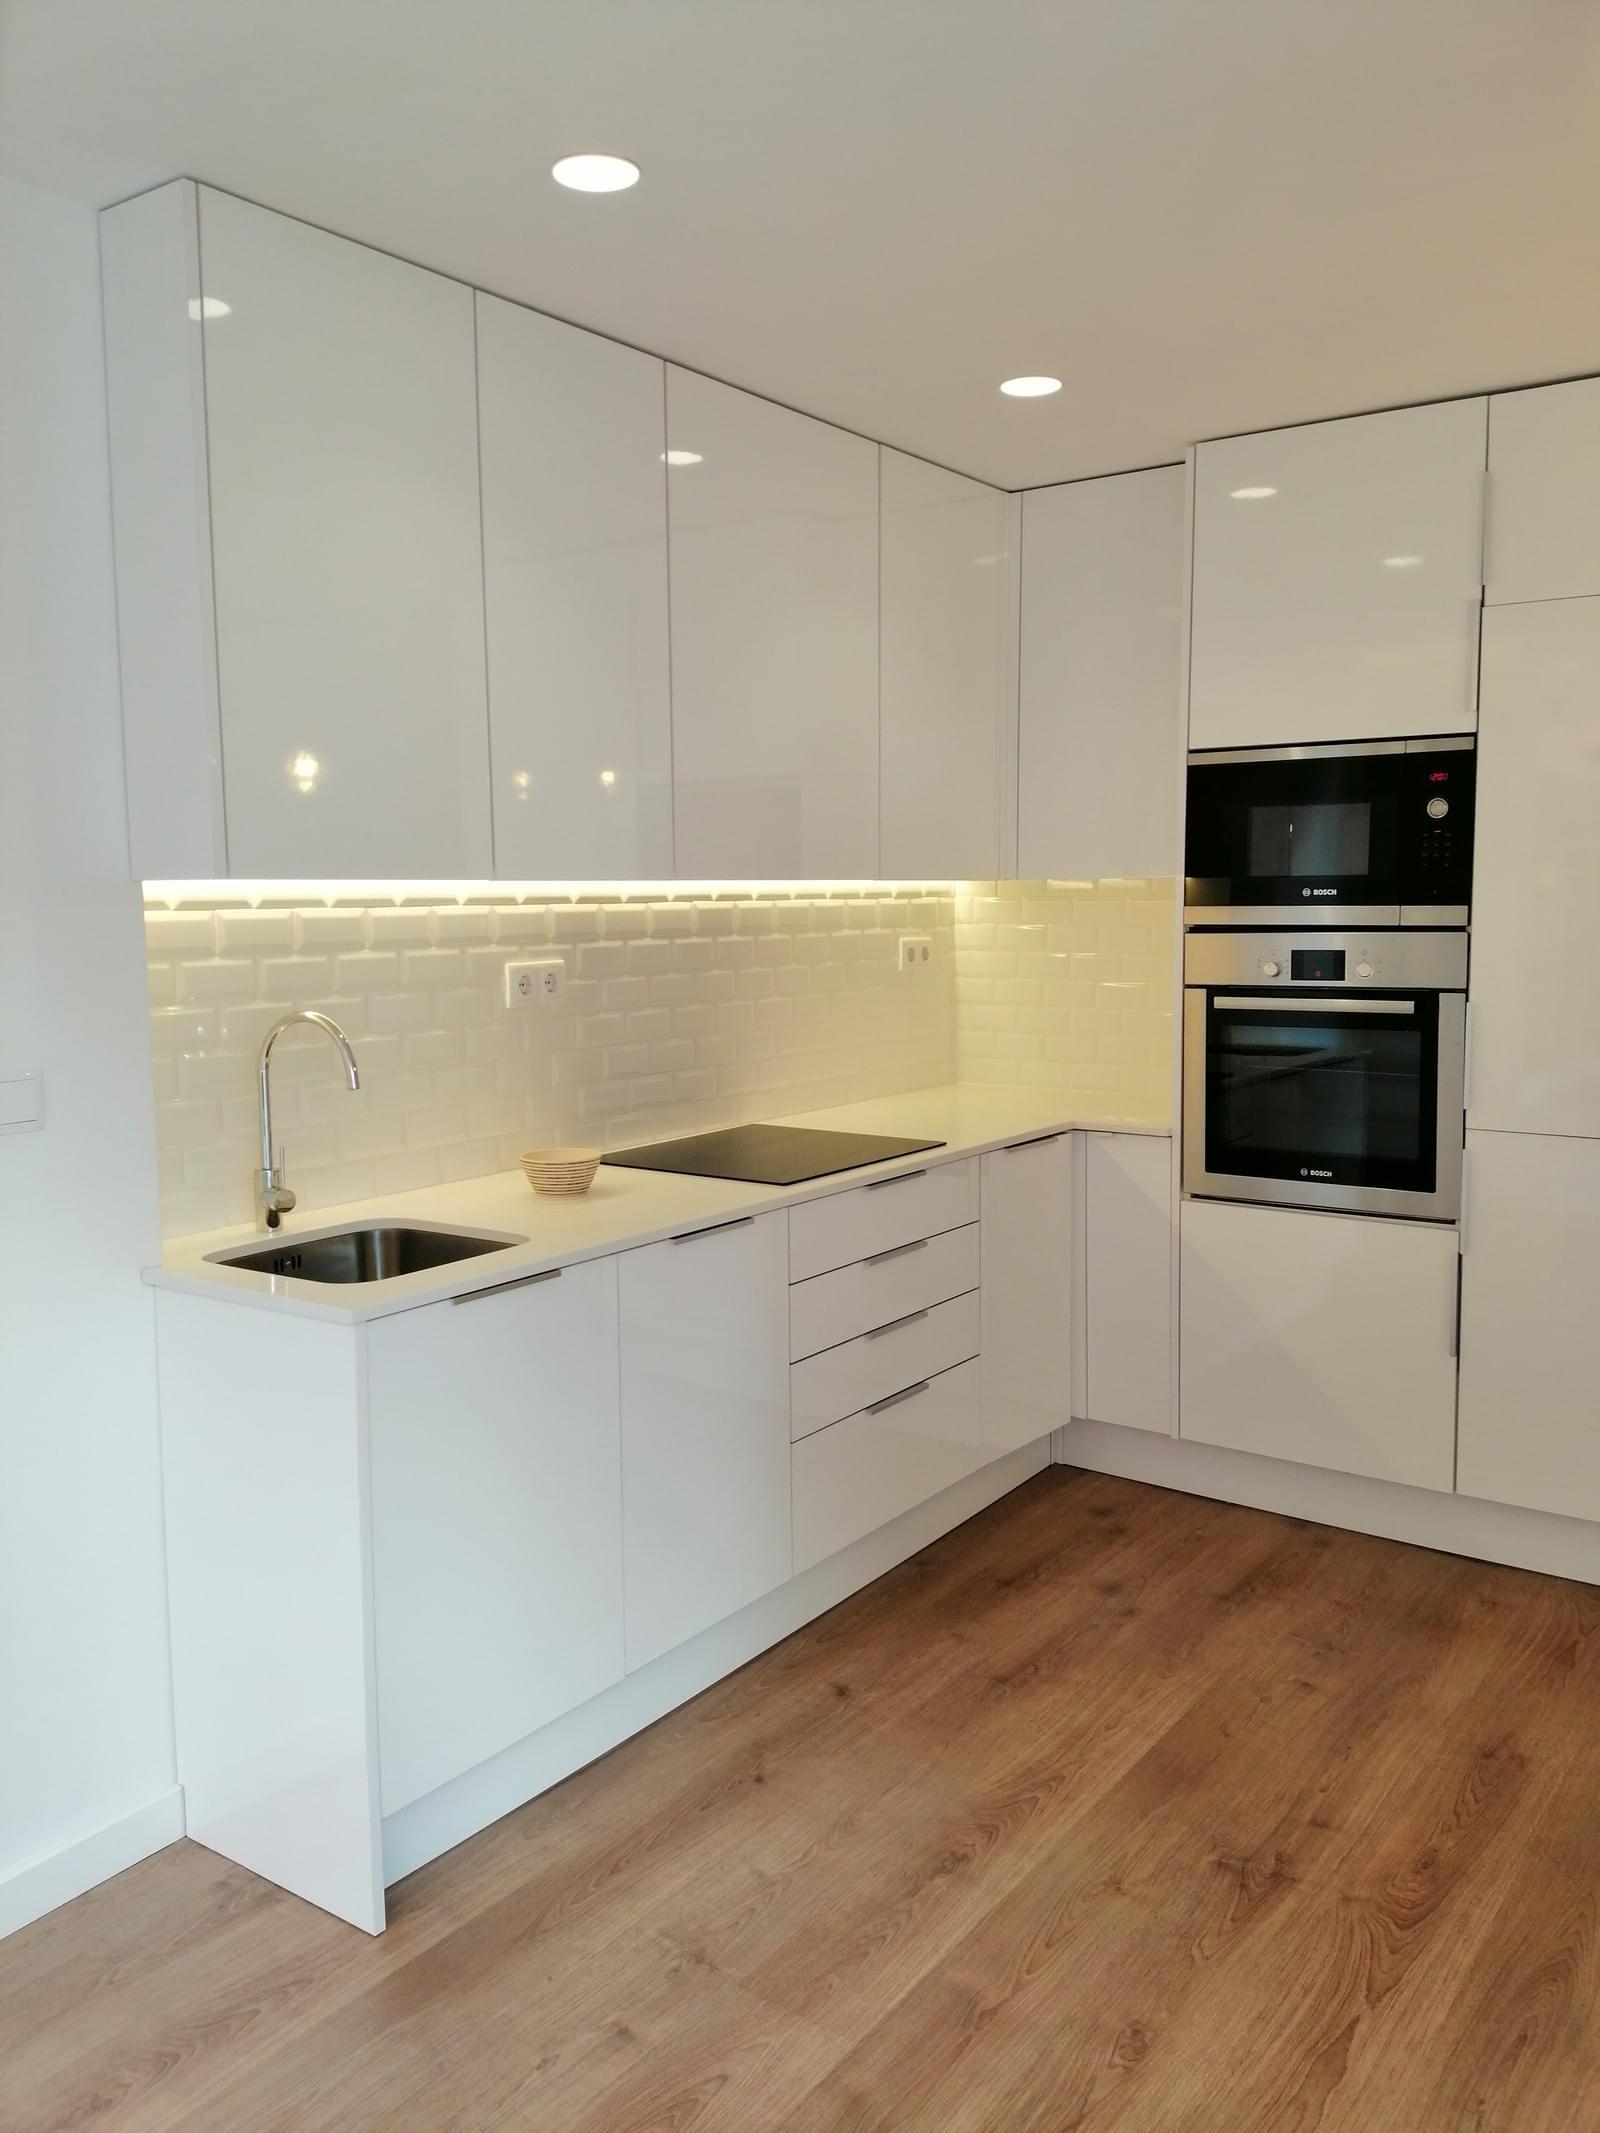 pf18996-apartamento-t3-lisboa-bb9d63e5-b4c6-4fdf-9e49-a441bd1dcc96